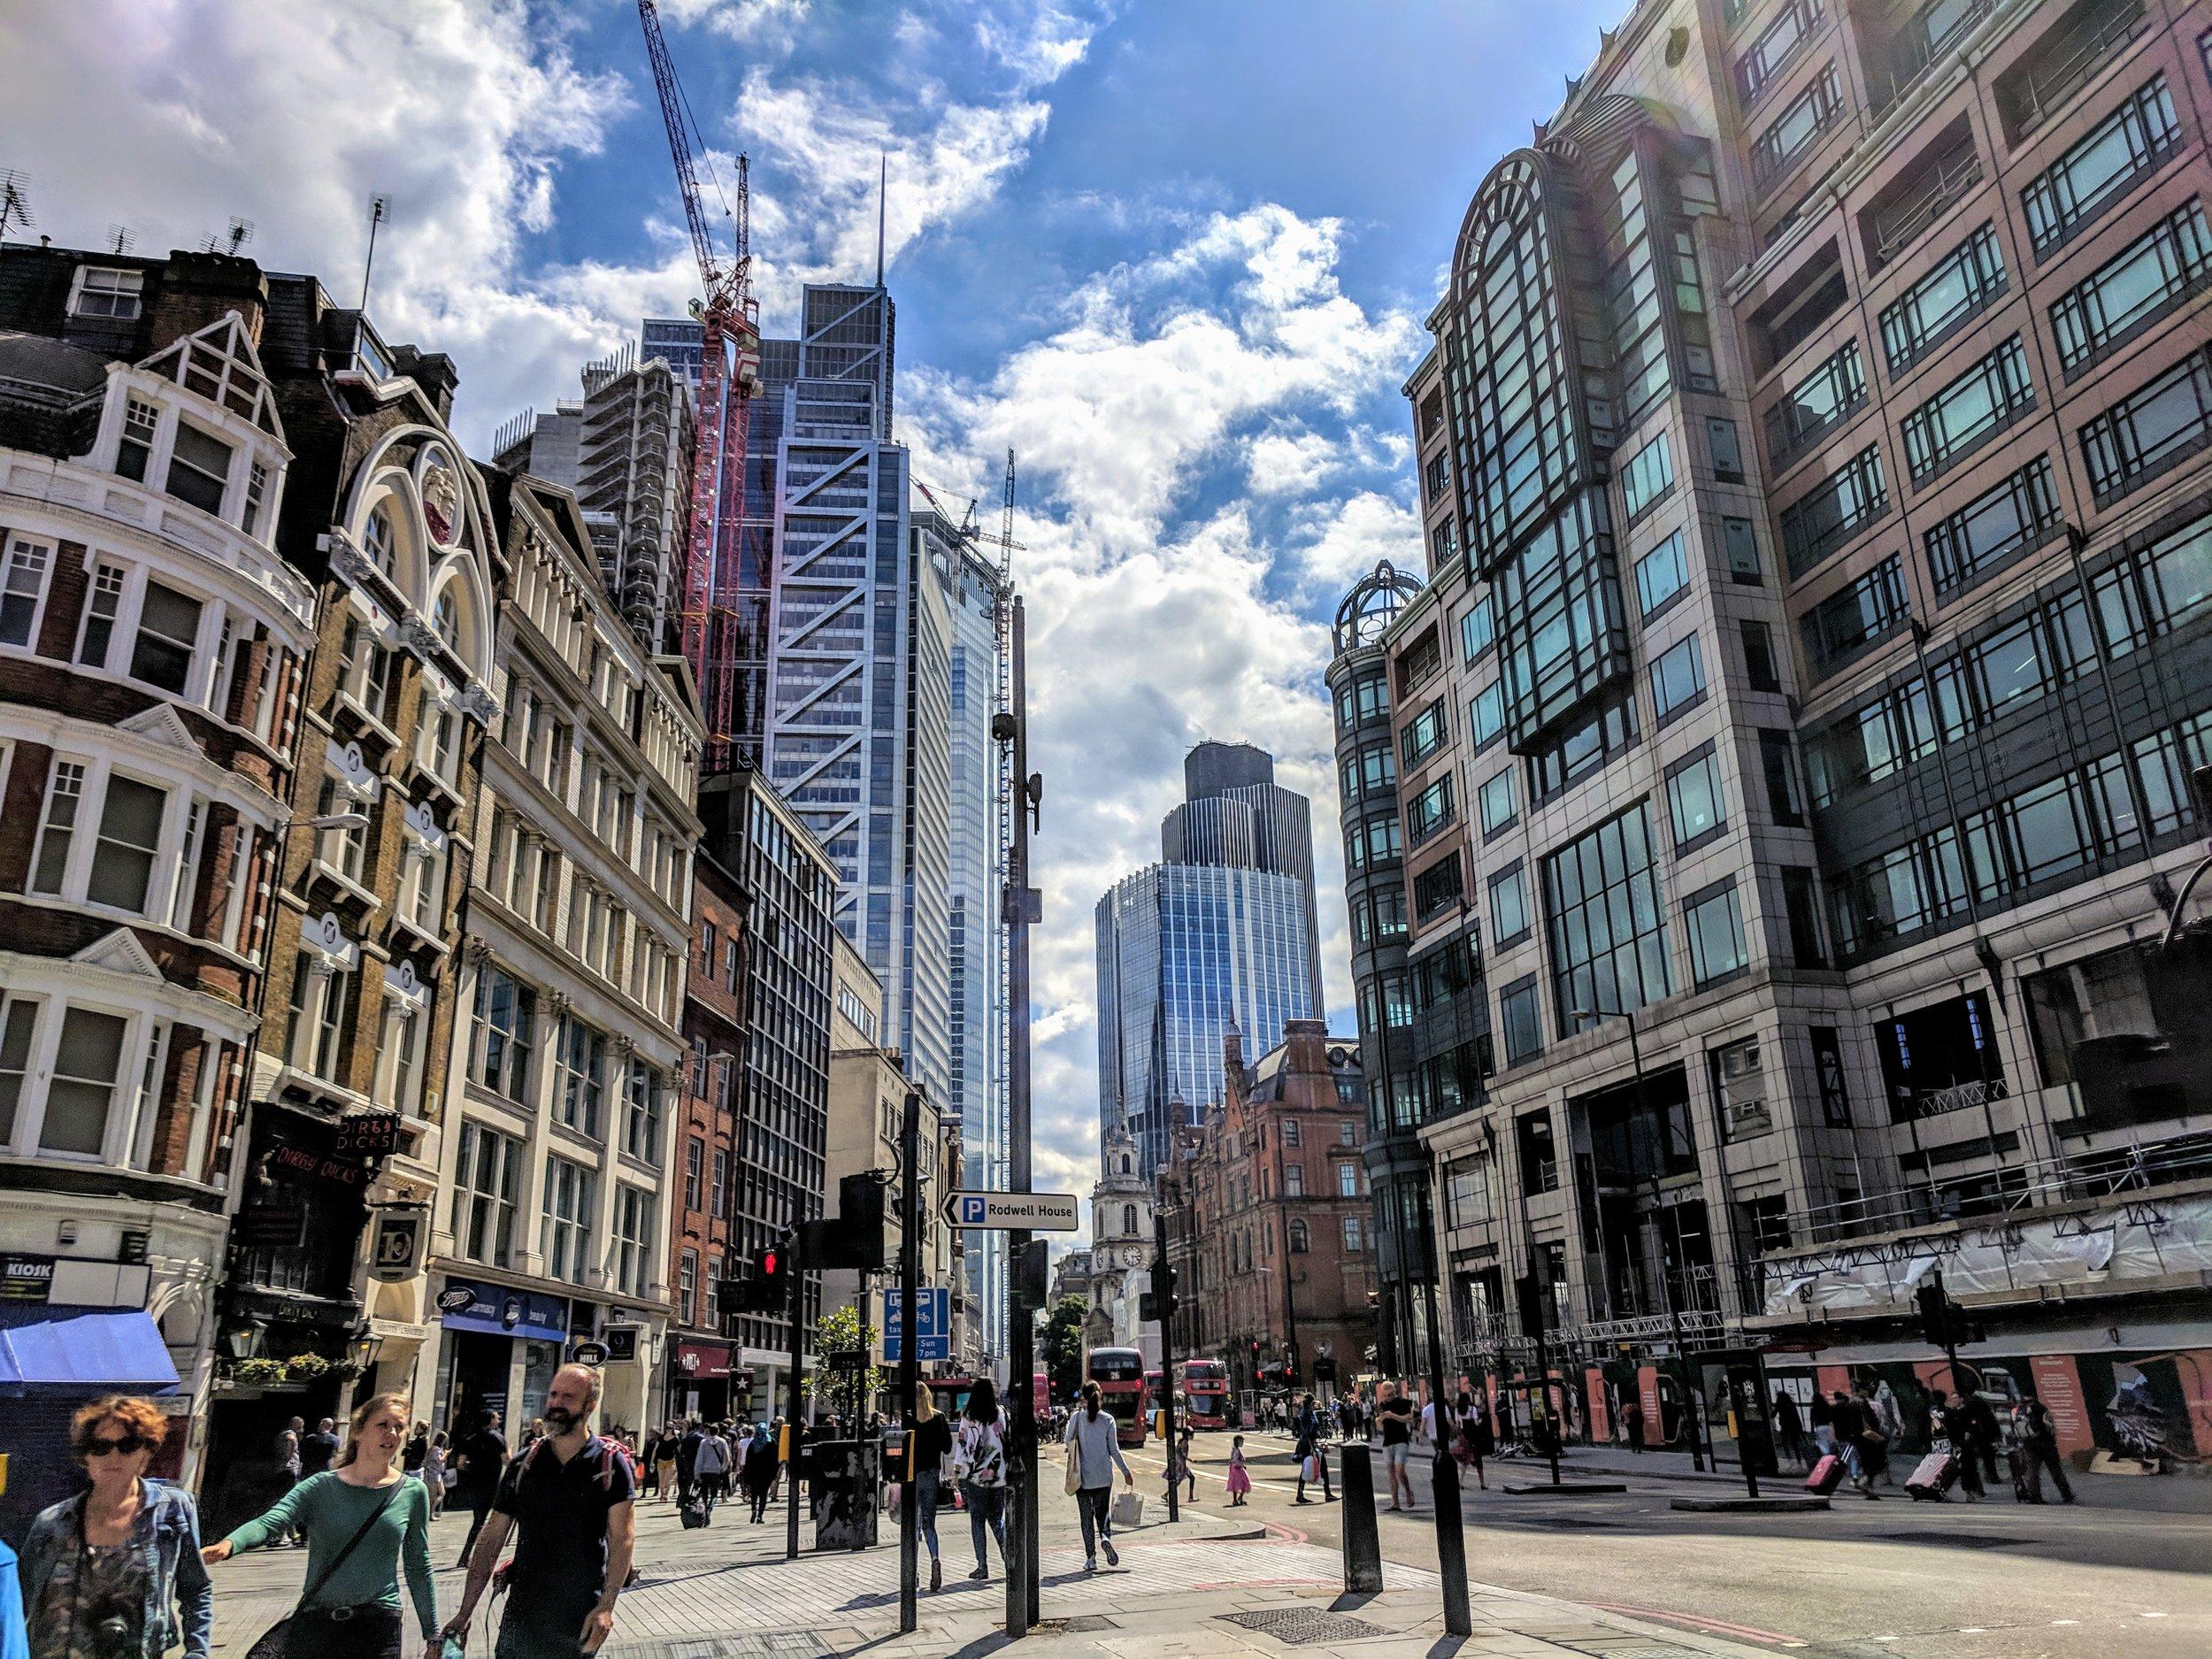 London Jun 2019: Spitalfields